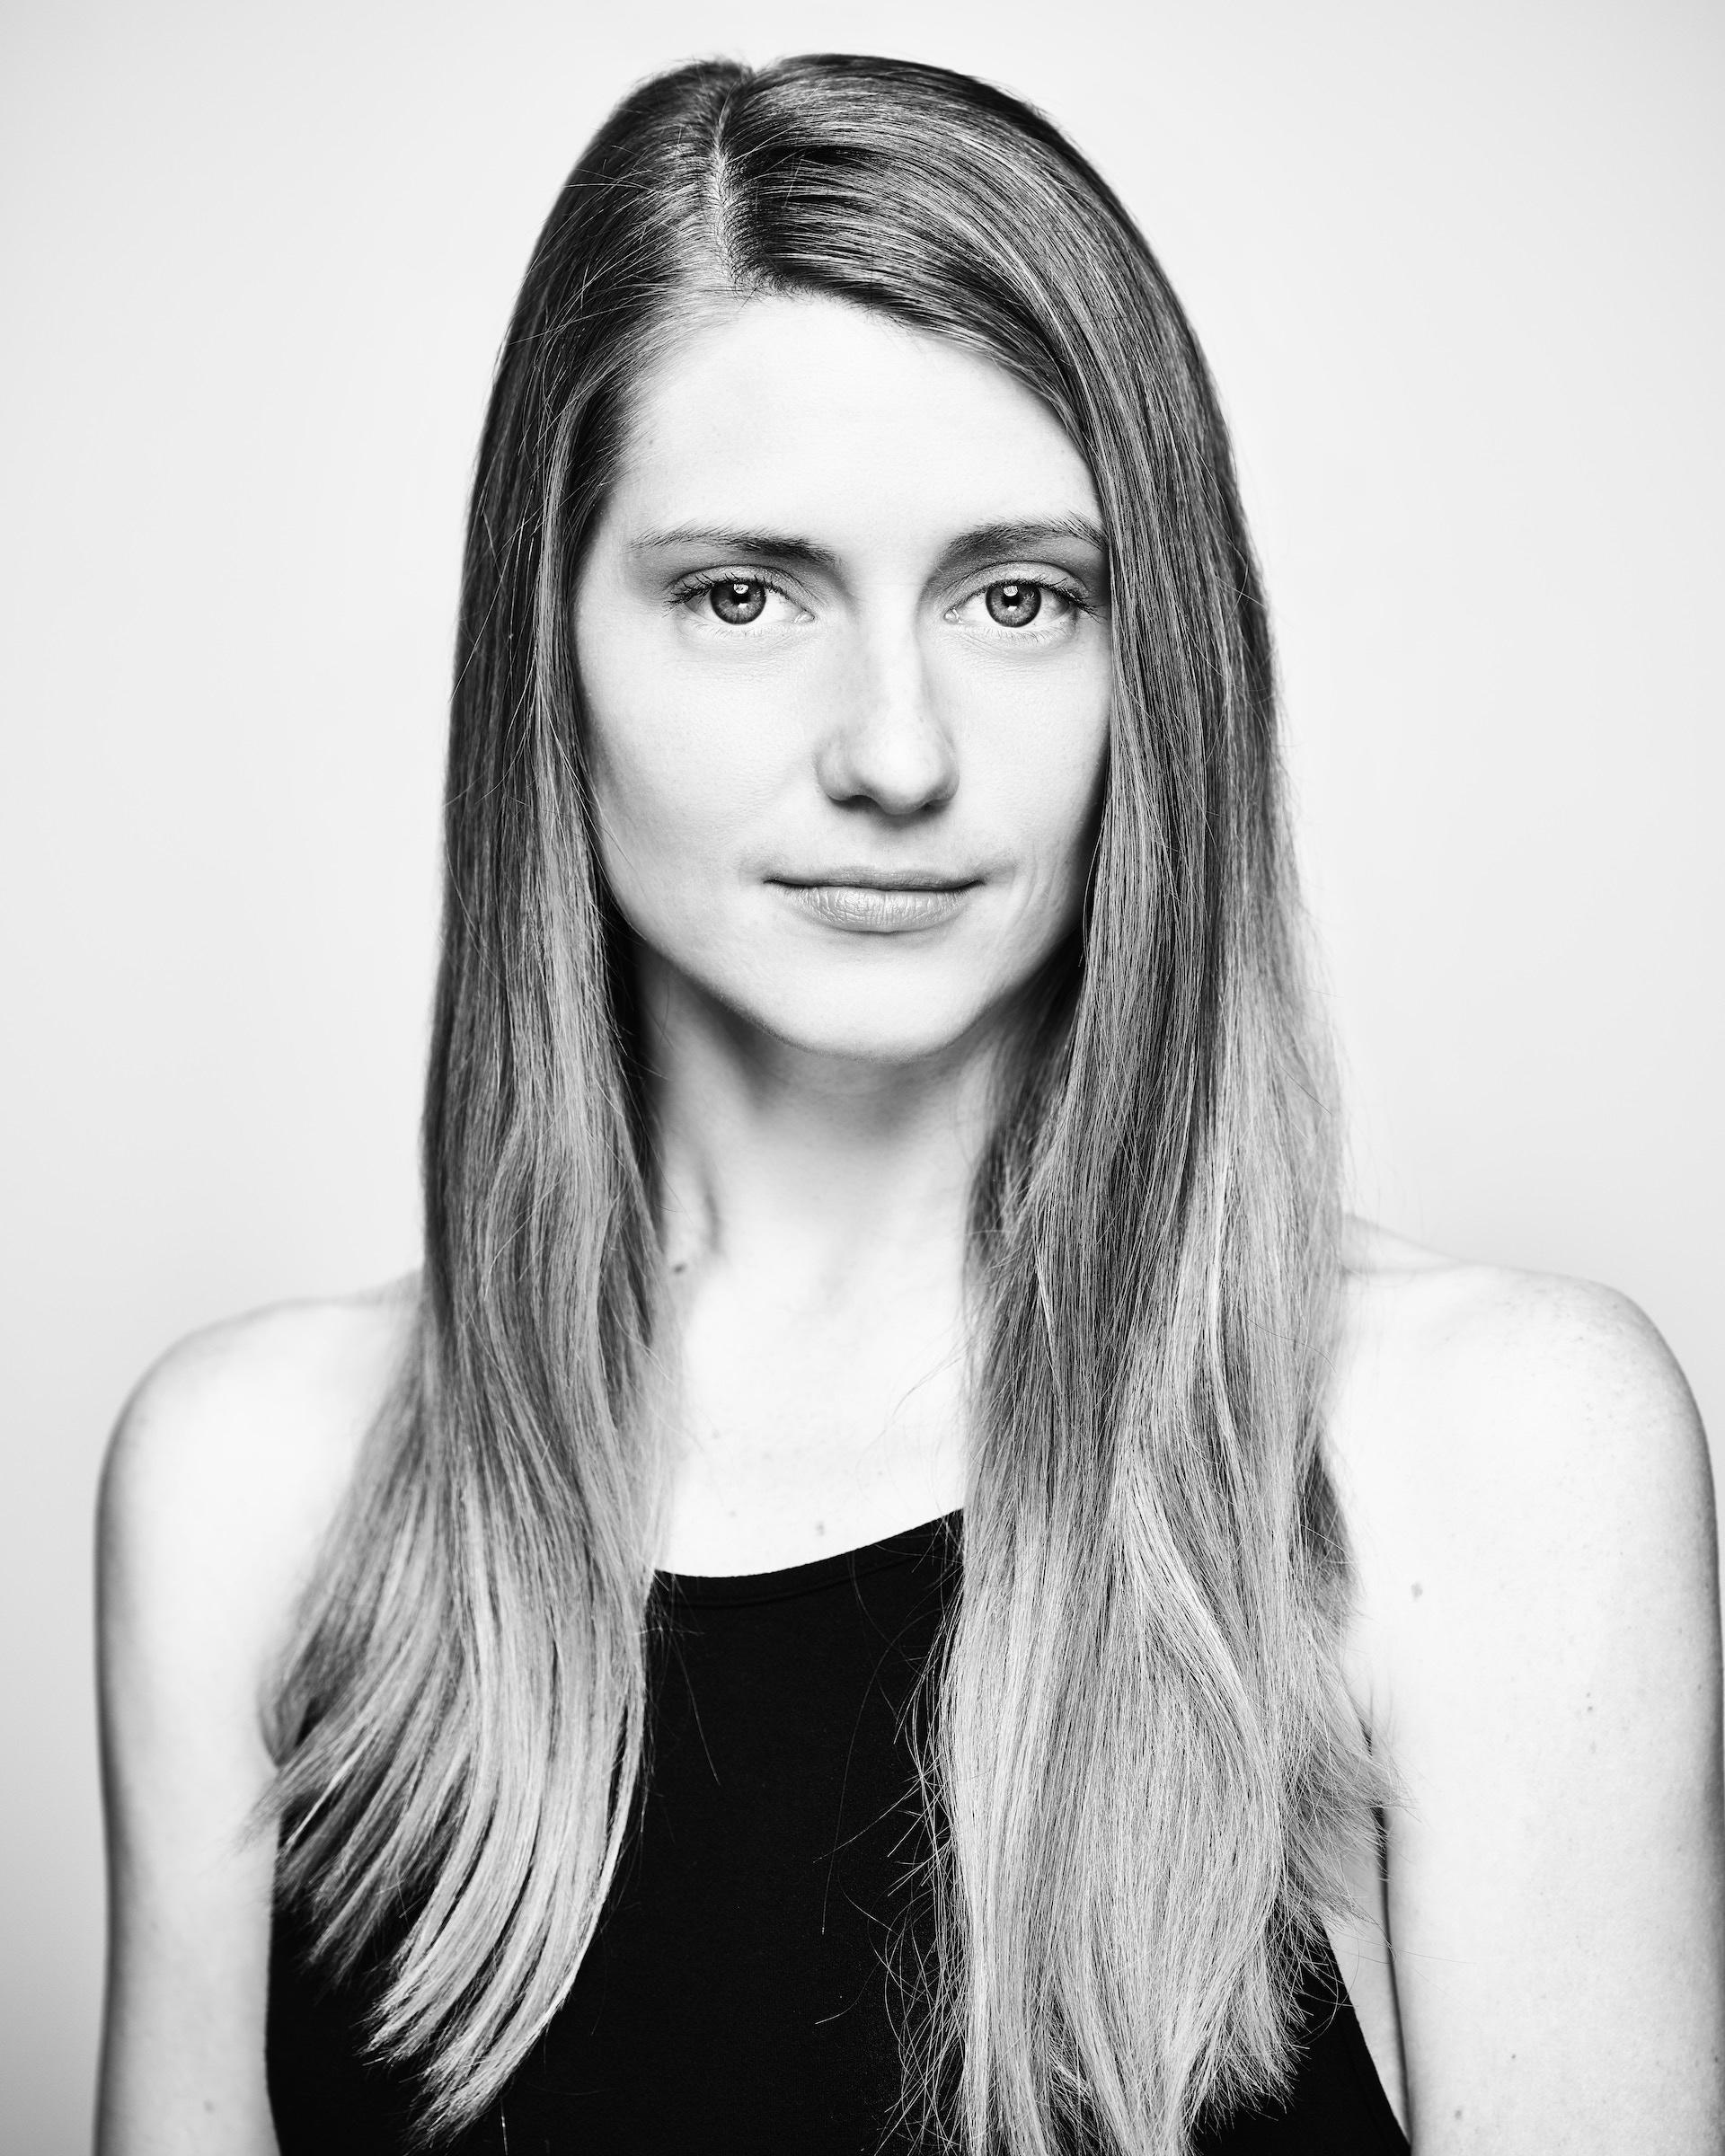 Theresa Knudson